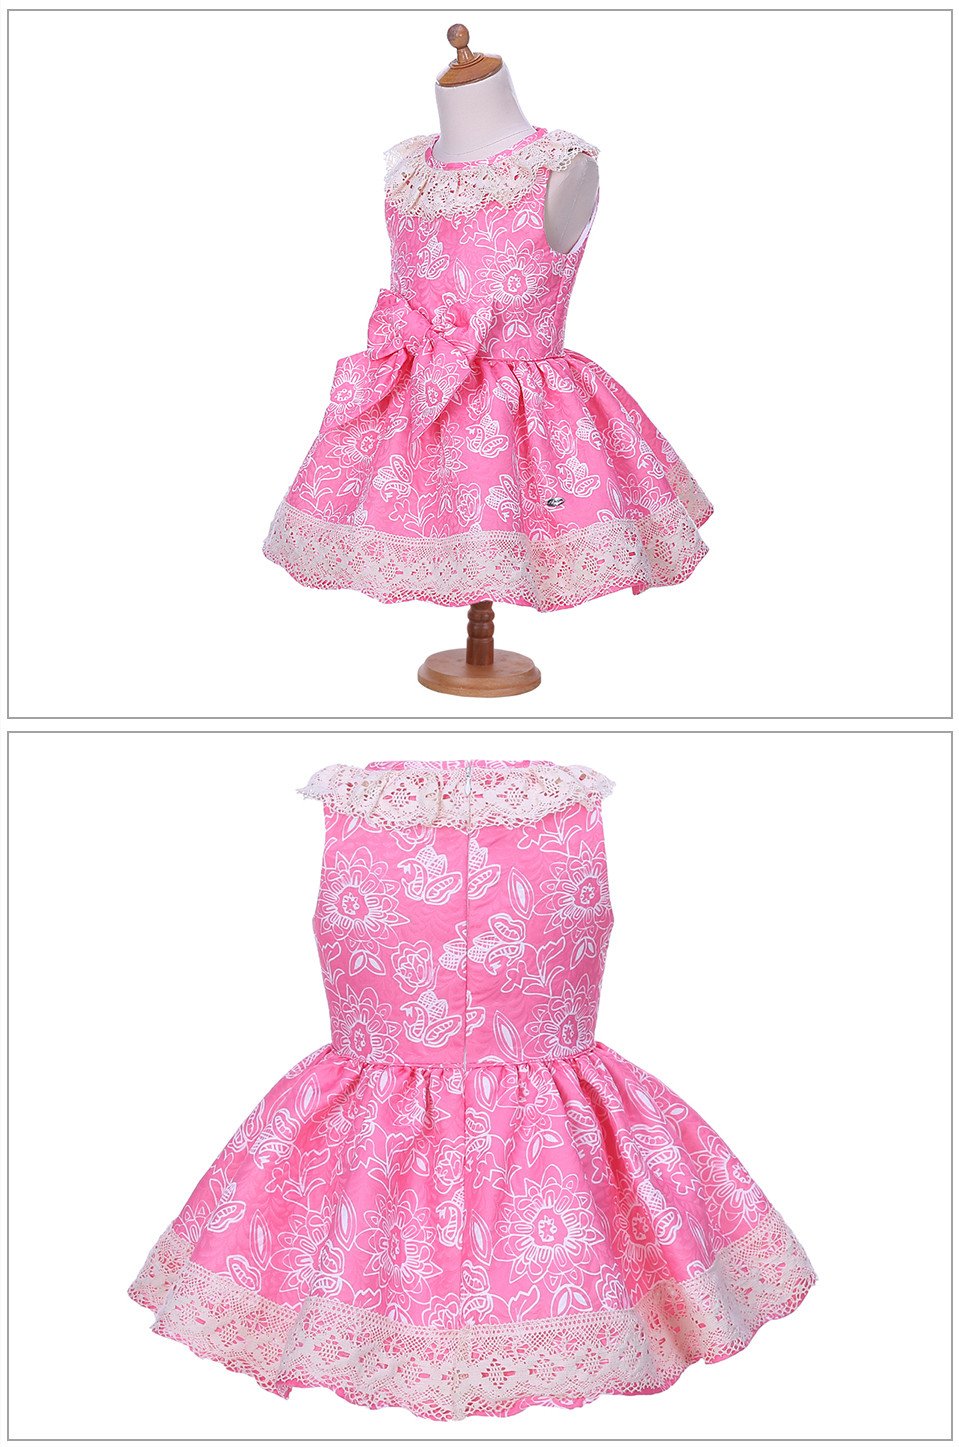 e803b4d45bdf0 Mareya Trade - Pettigirl Pink Flower Print Girl Dress Lace Collar ...